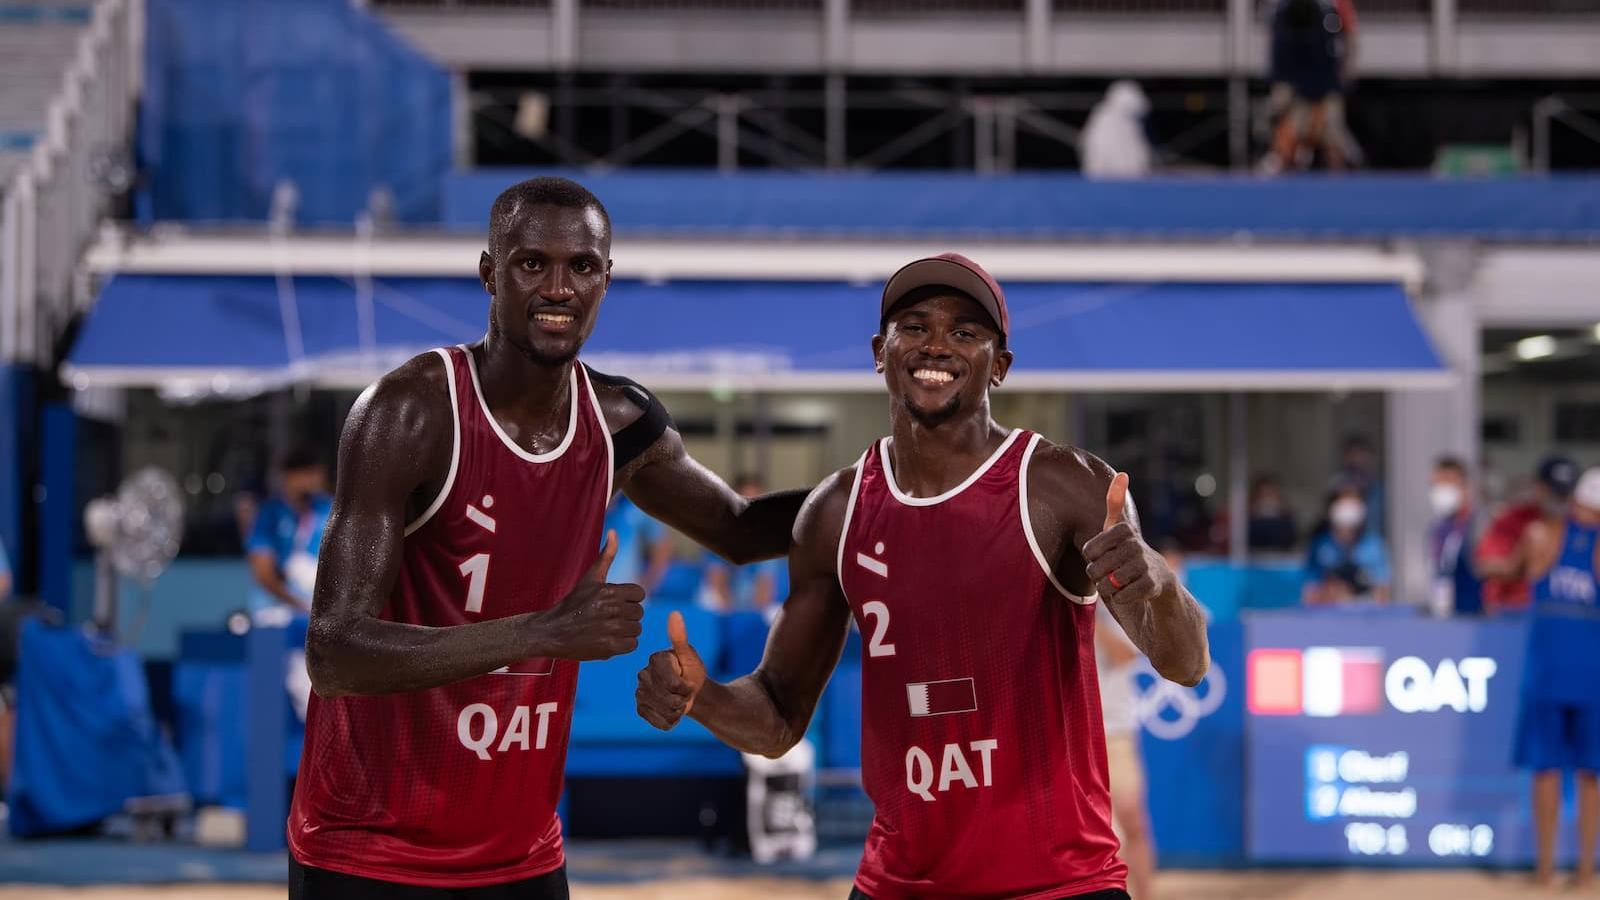 Qatar Beach Volleyball team progress to quarter-finals at Tokyo Olympics 2020